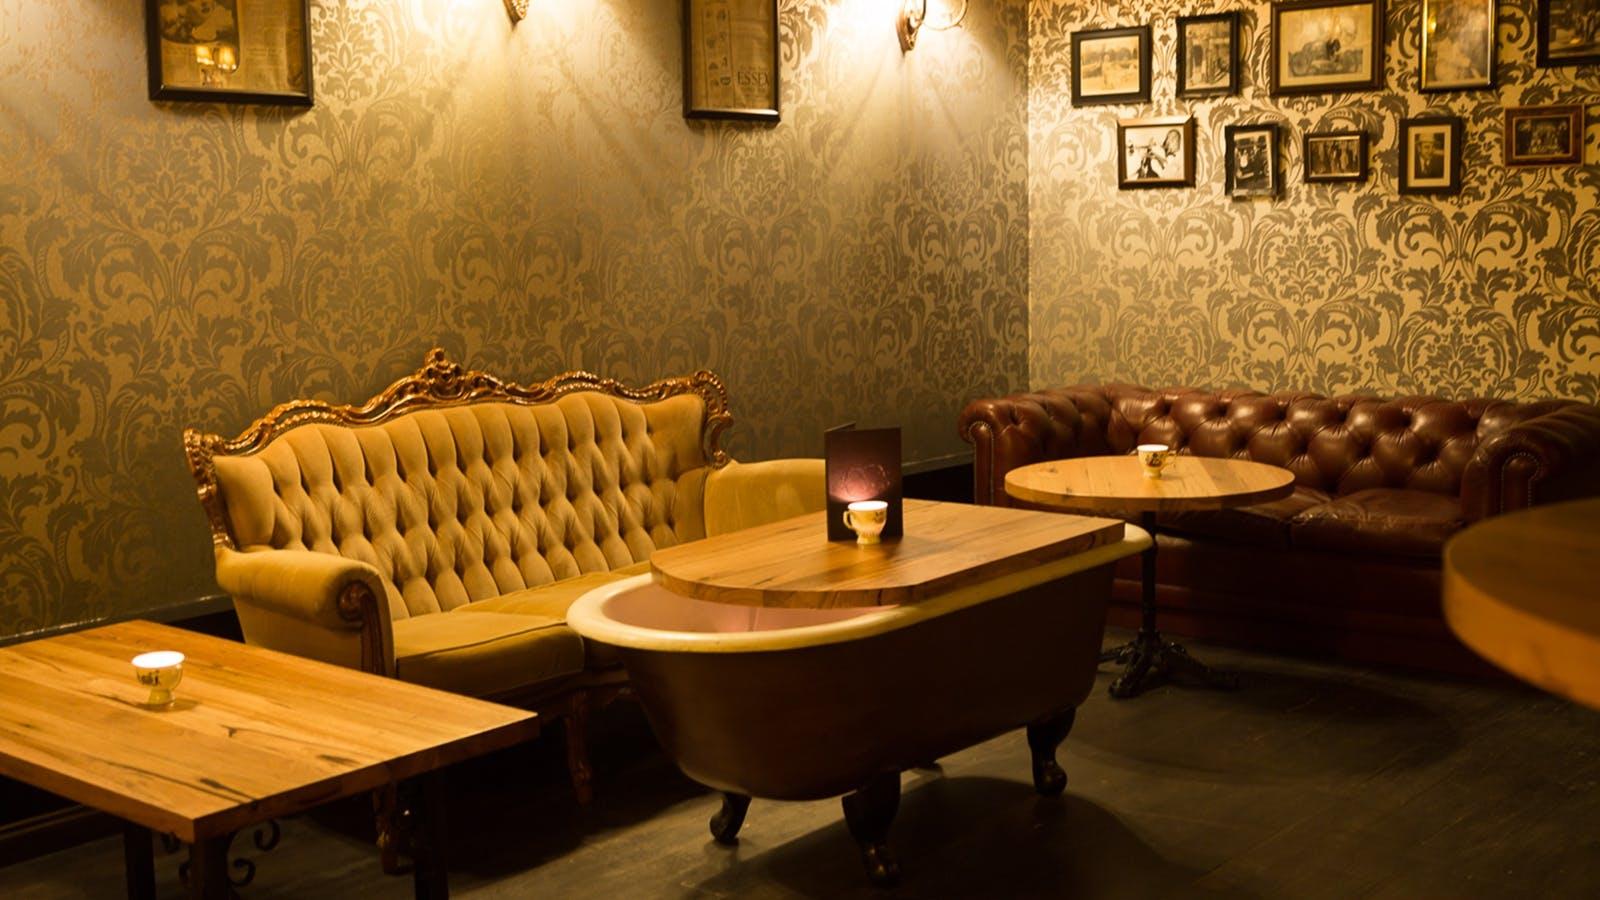 The Bathtub Gin Lounge